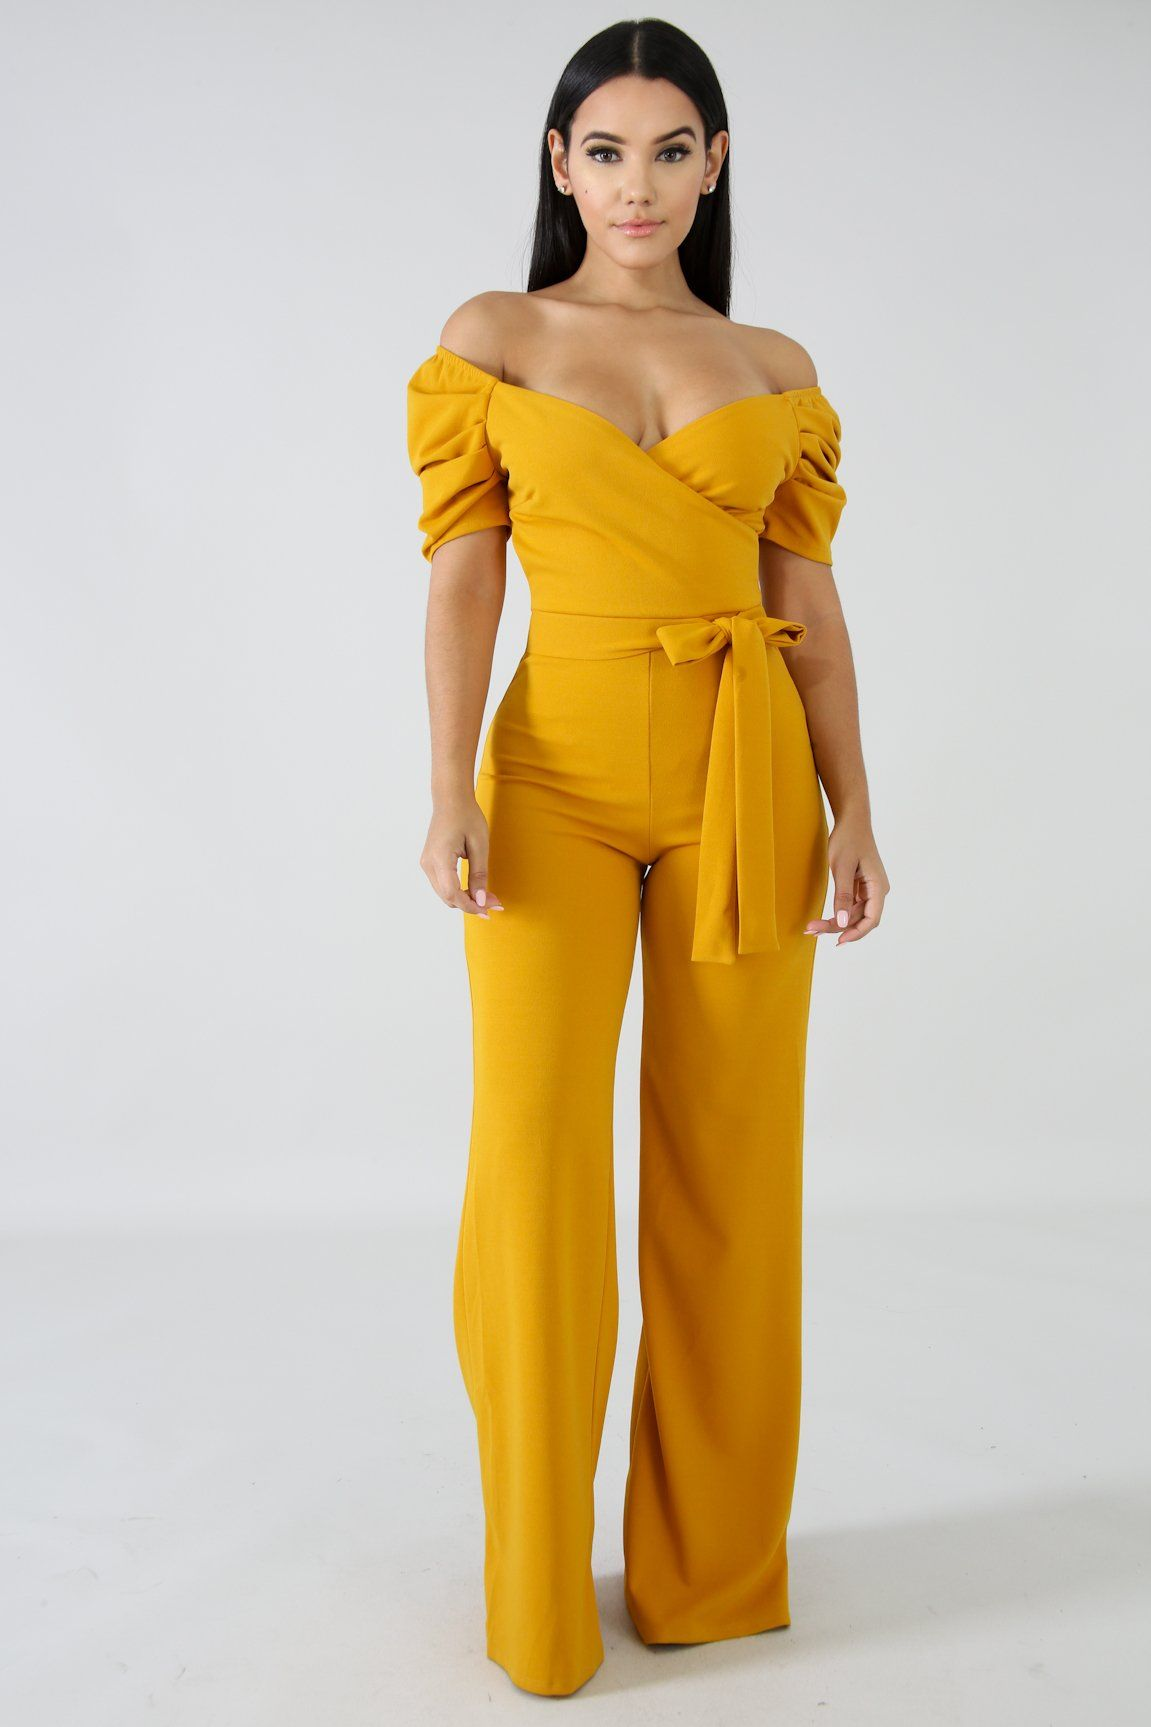 Naufragio Celsius Excesivo  Angelina Jumpsuit   Jumpsuit fashion, Yellow fashion, Jumpsuit dress